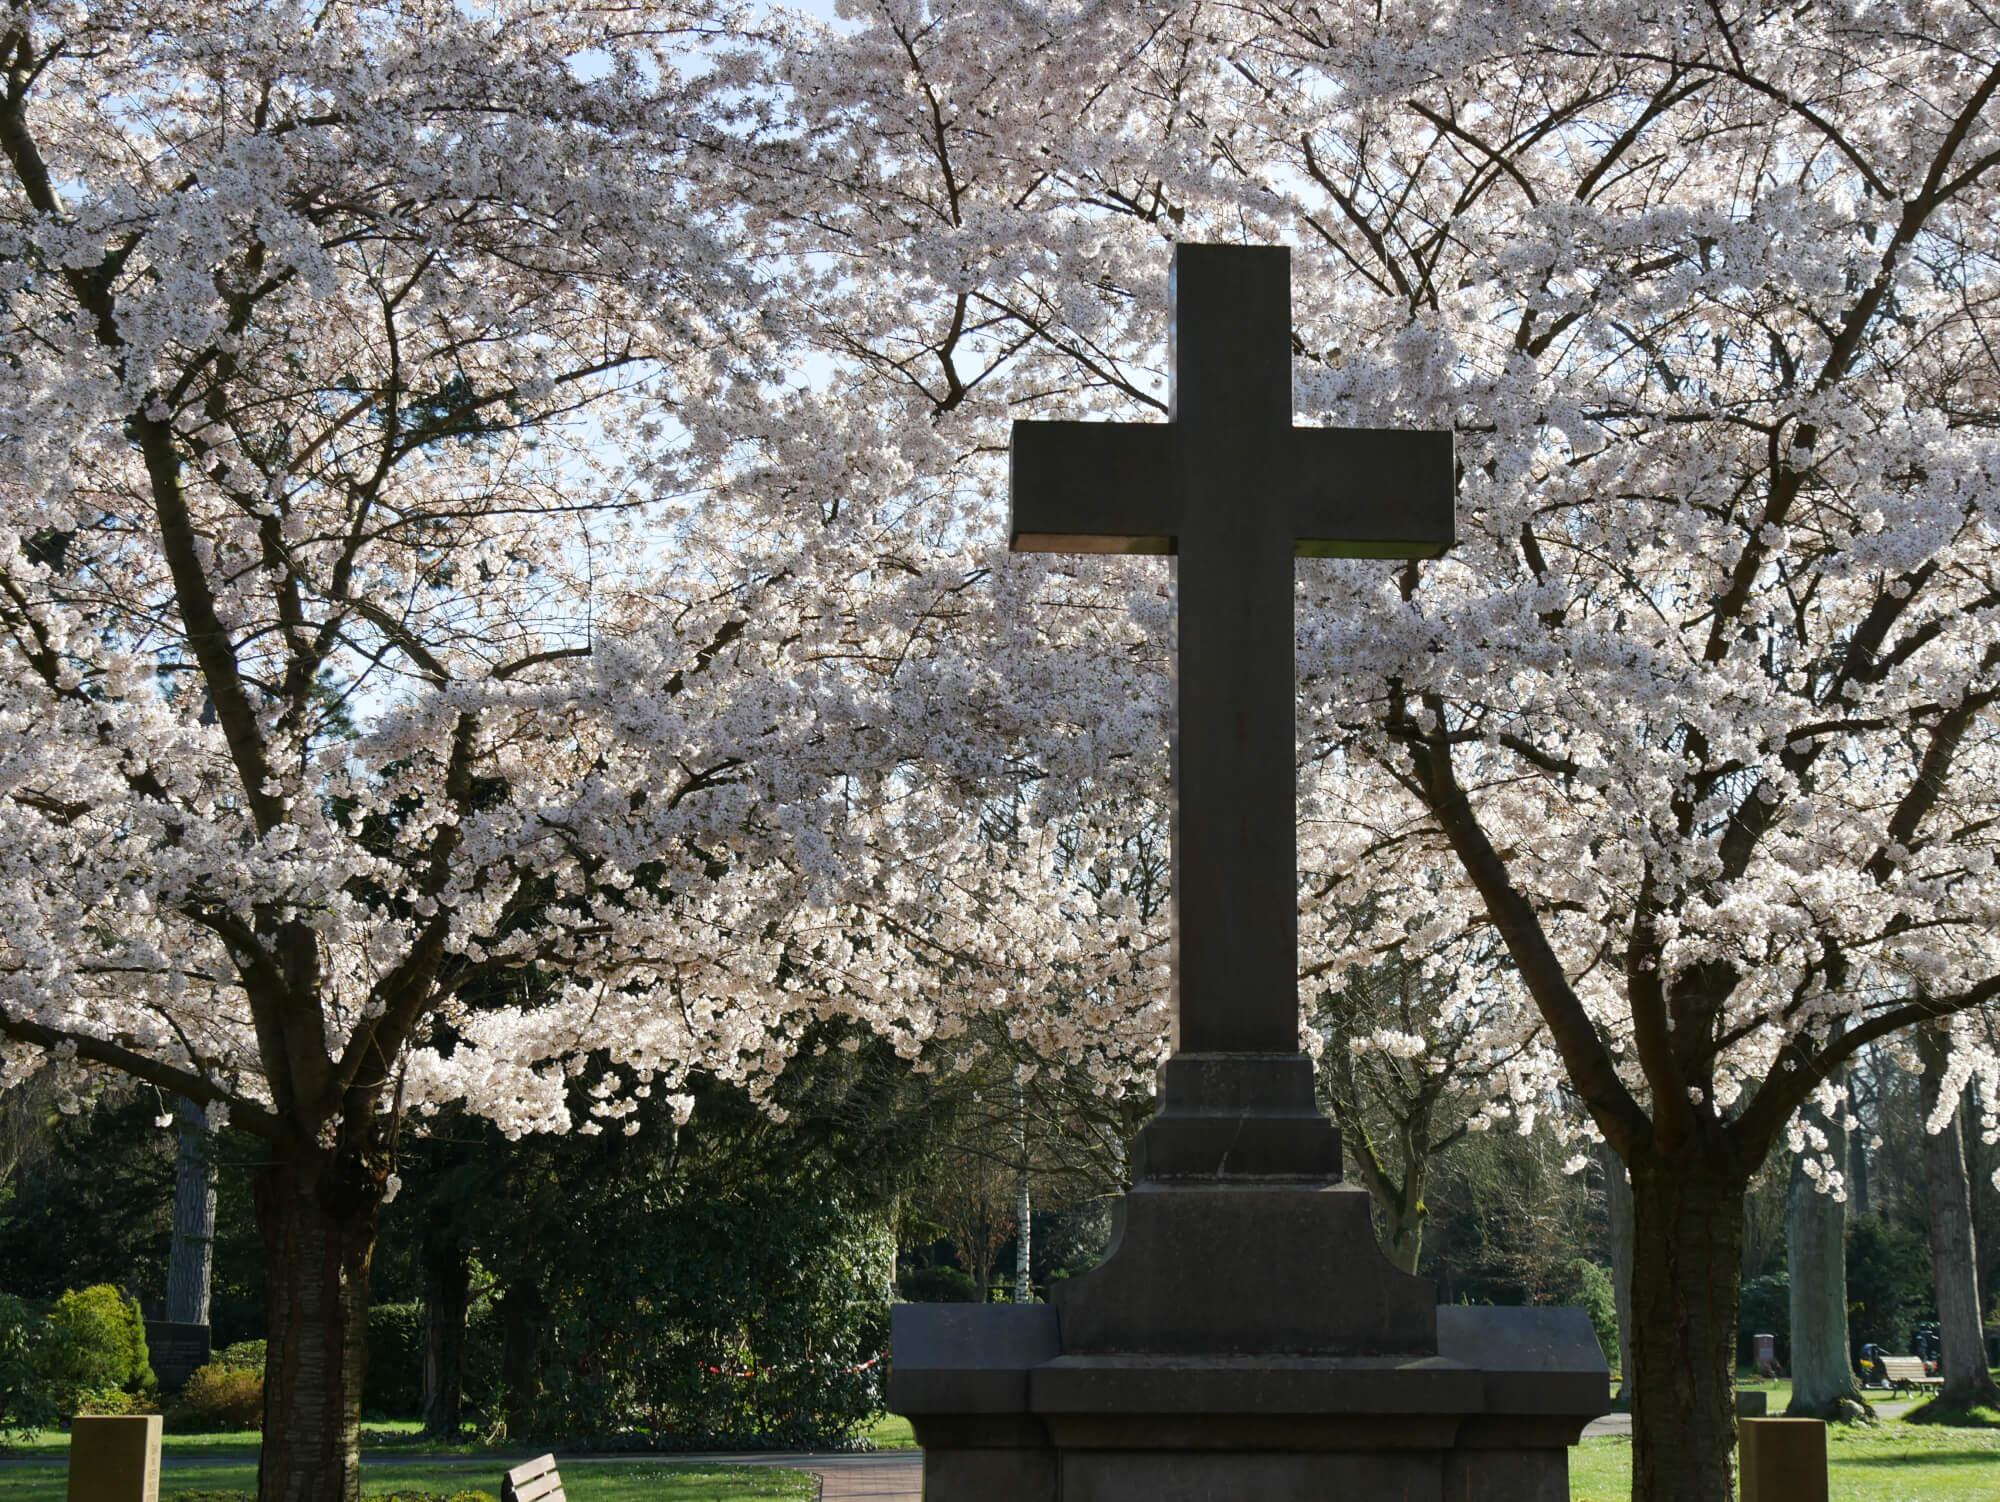 Gravestone in front of flowering trees